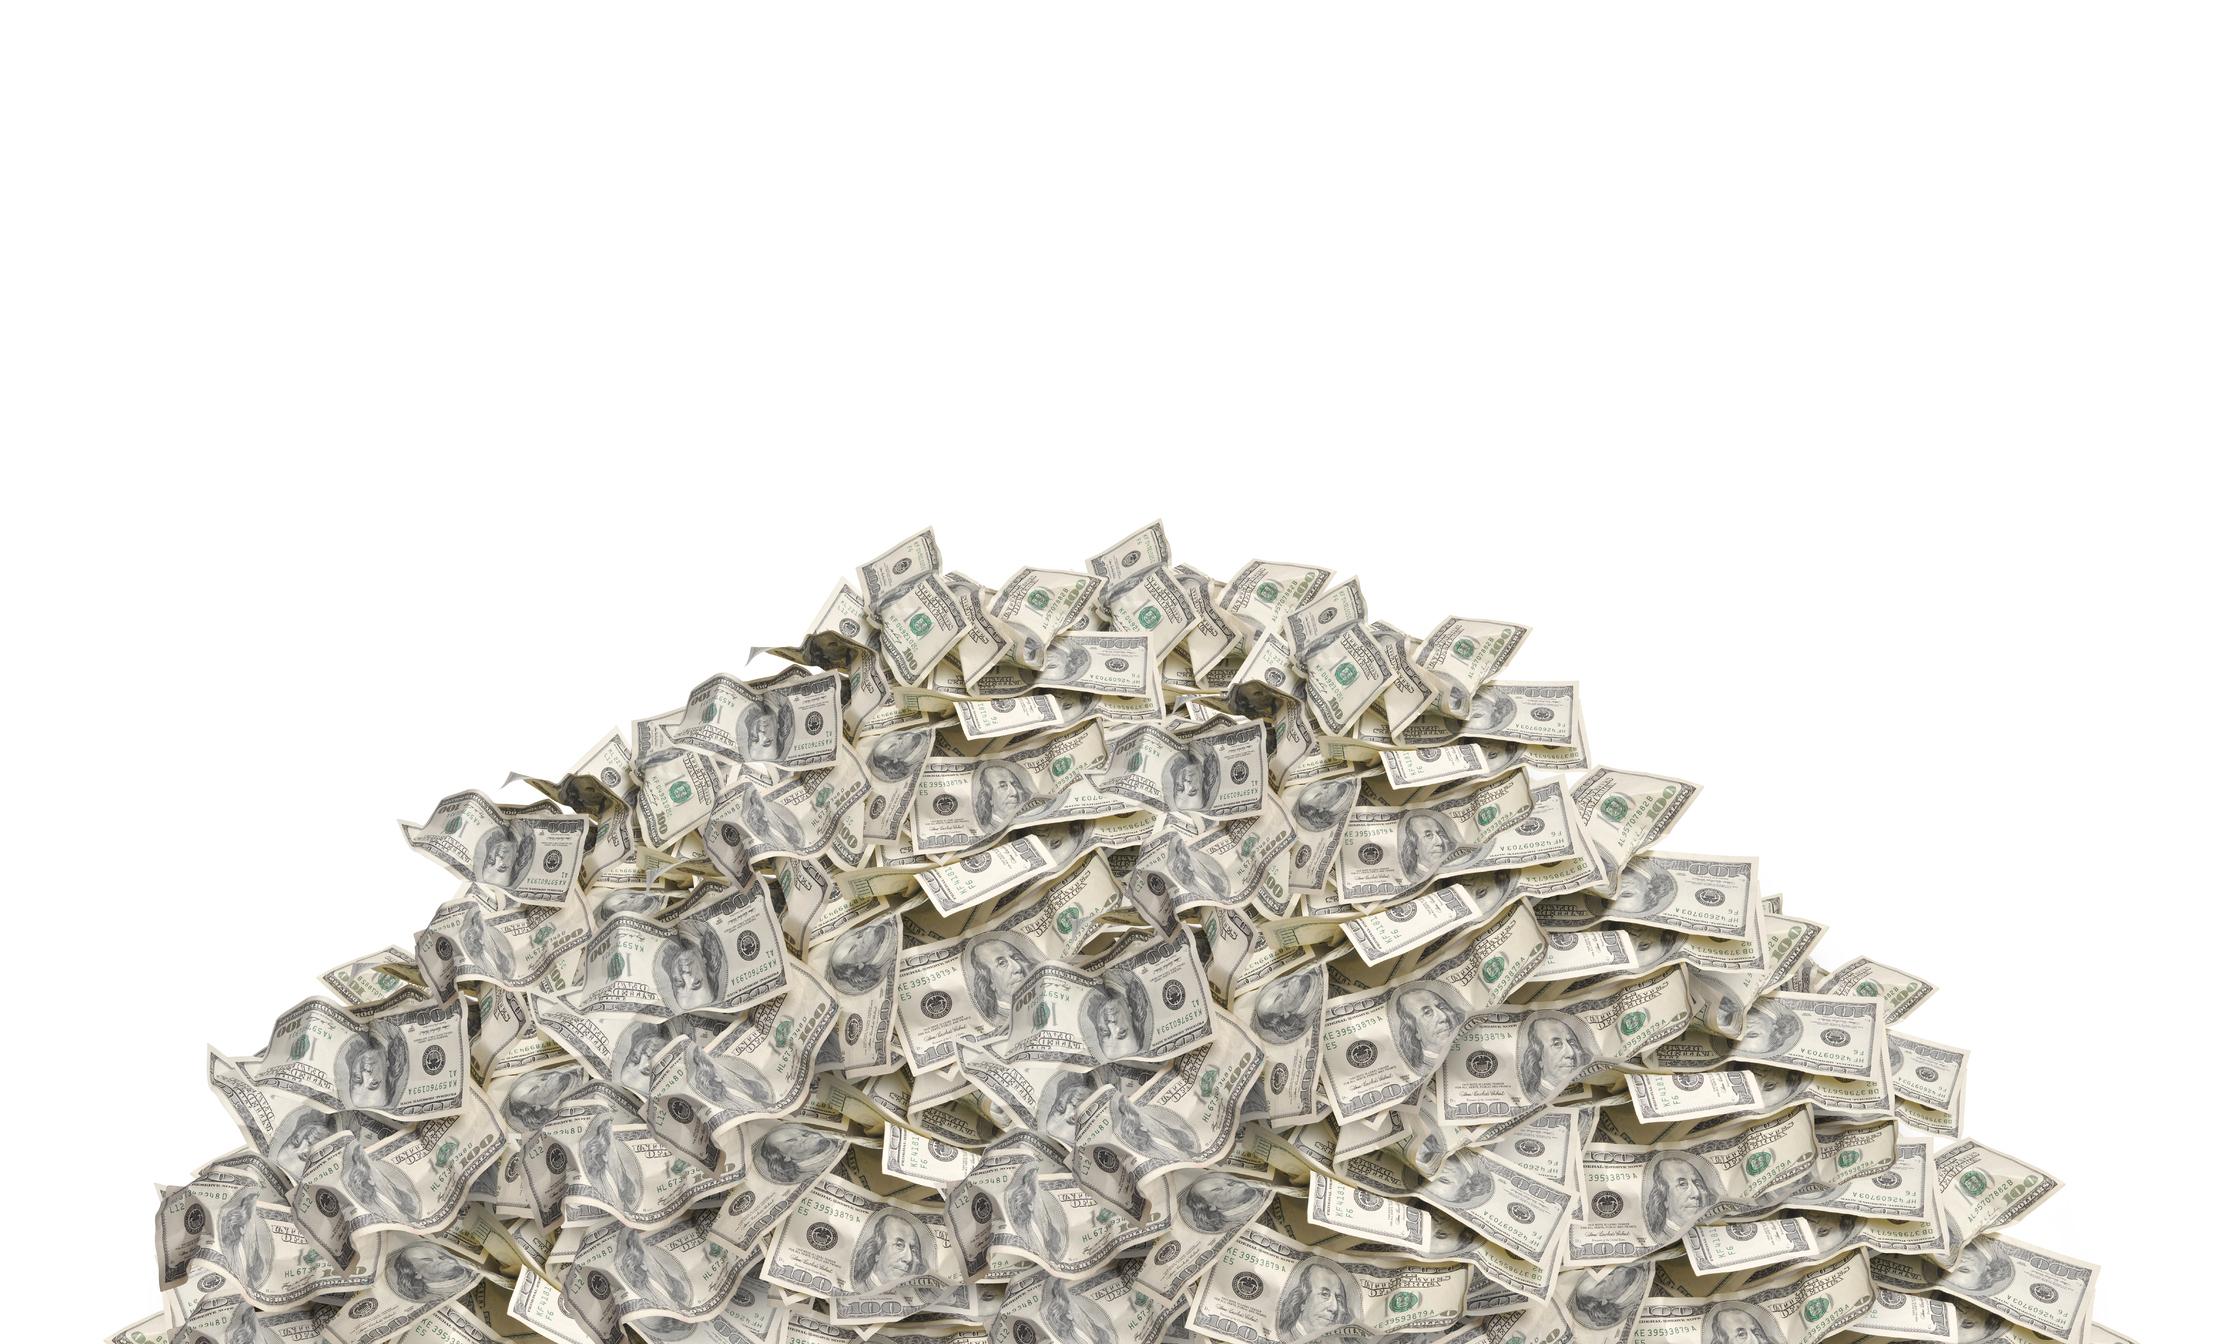 A pile of dollar bills